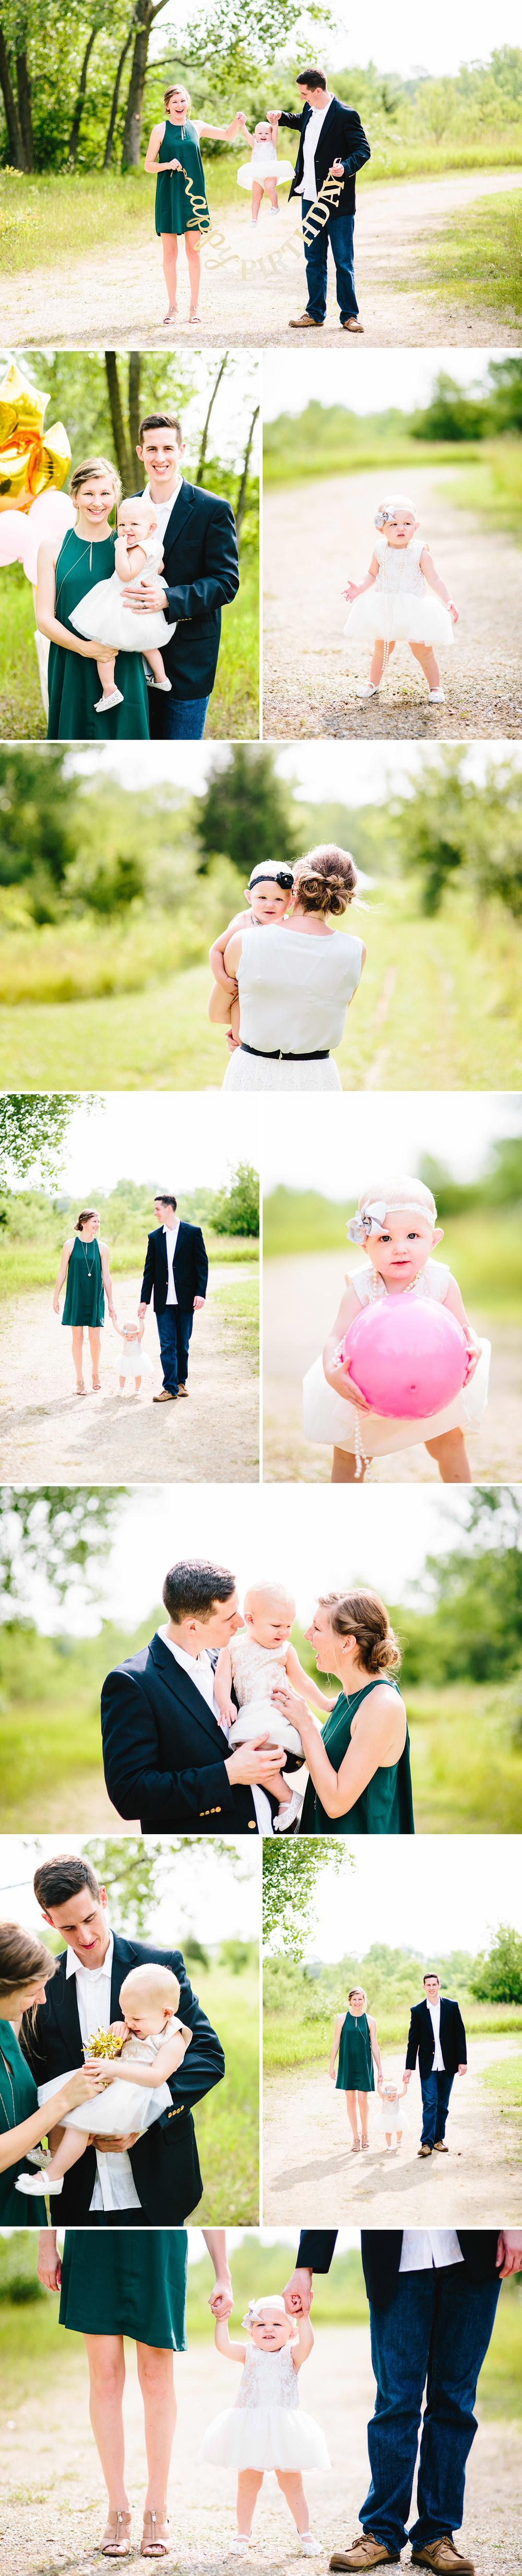 chicago-fine-art-wedding-photography-charlotte1